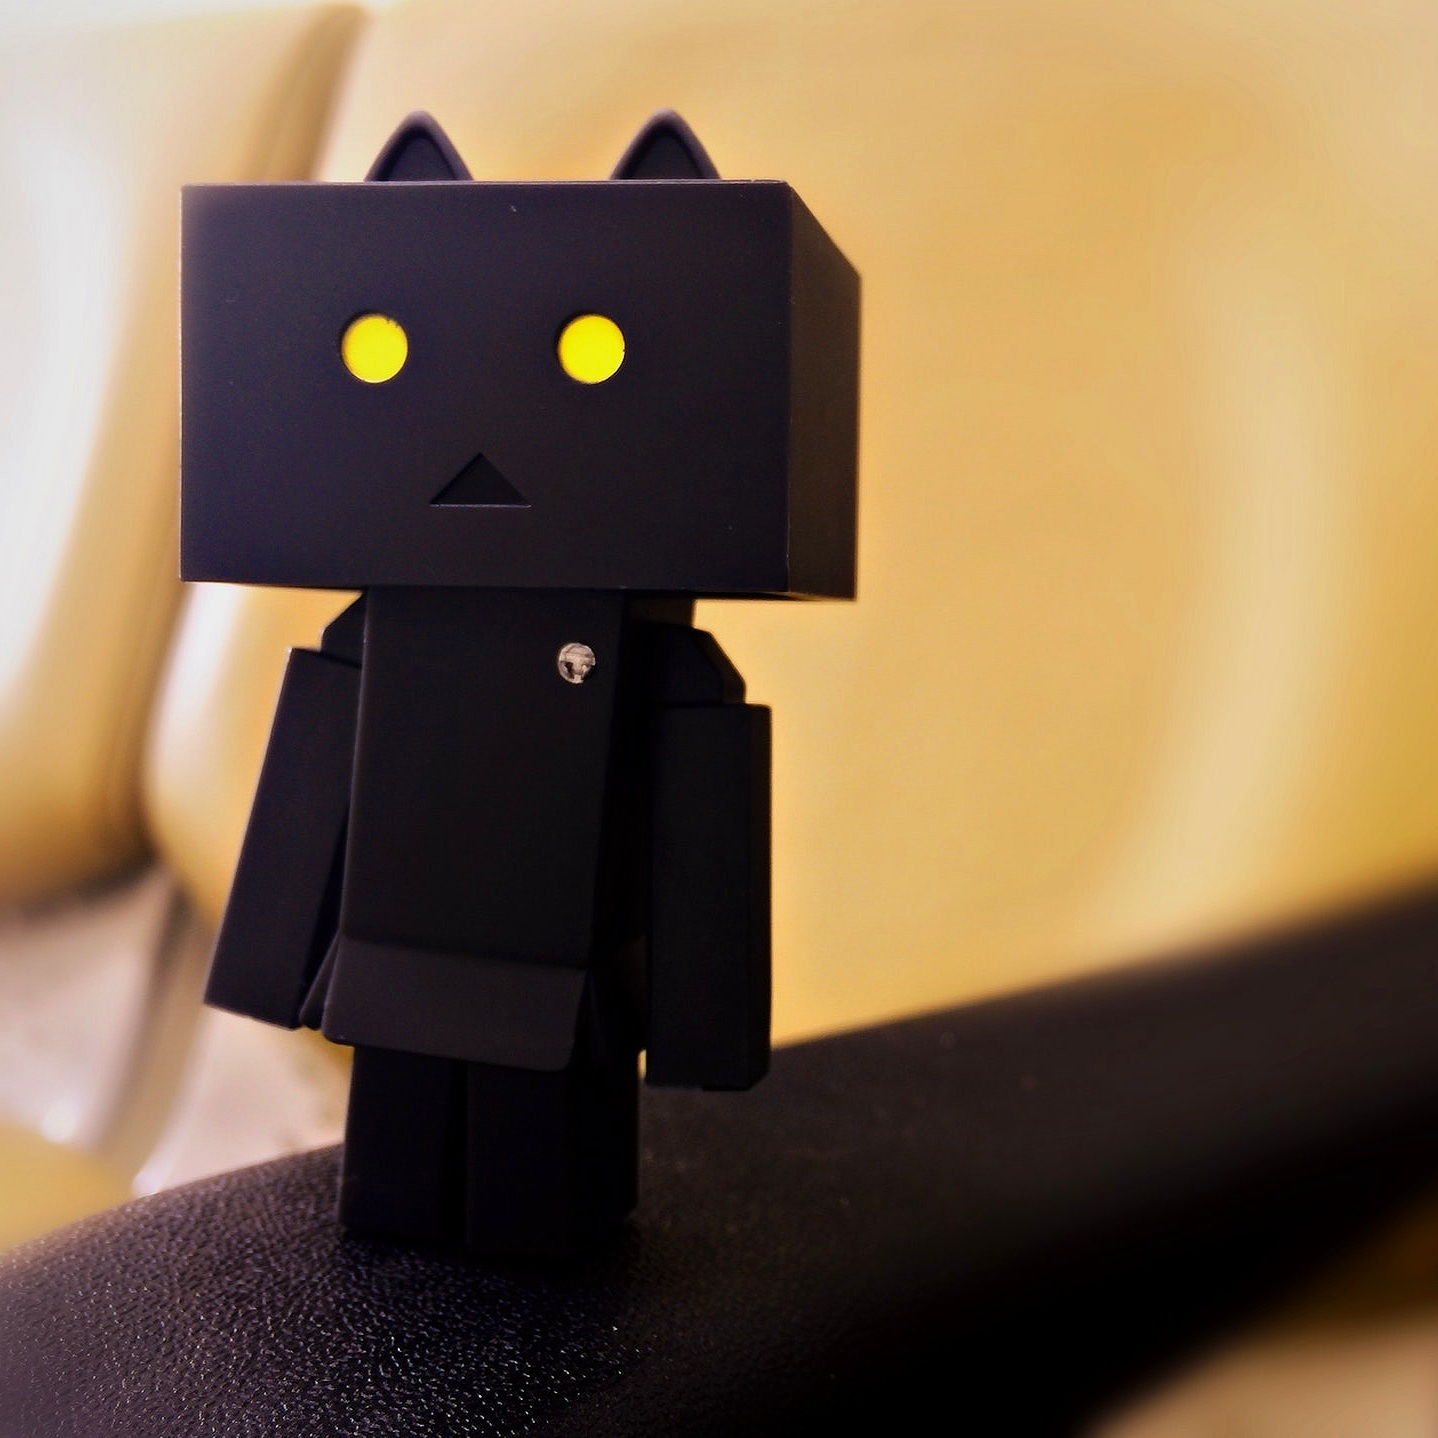 animation-black-blur-262297.jpg